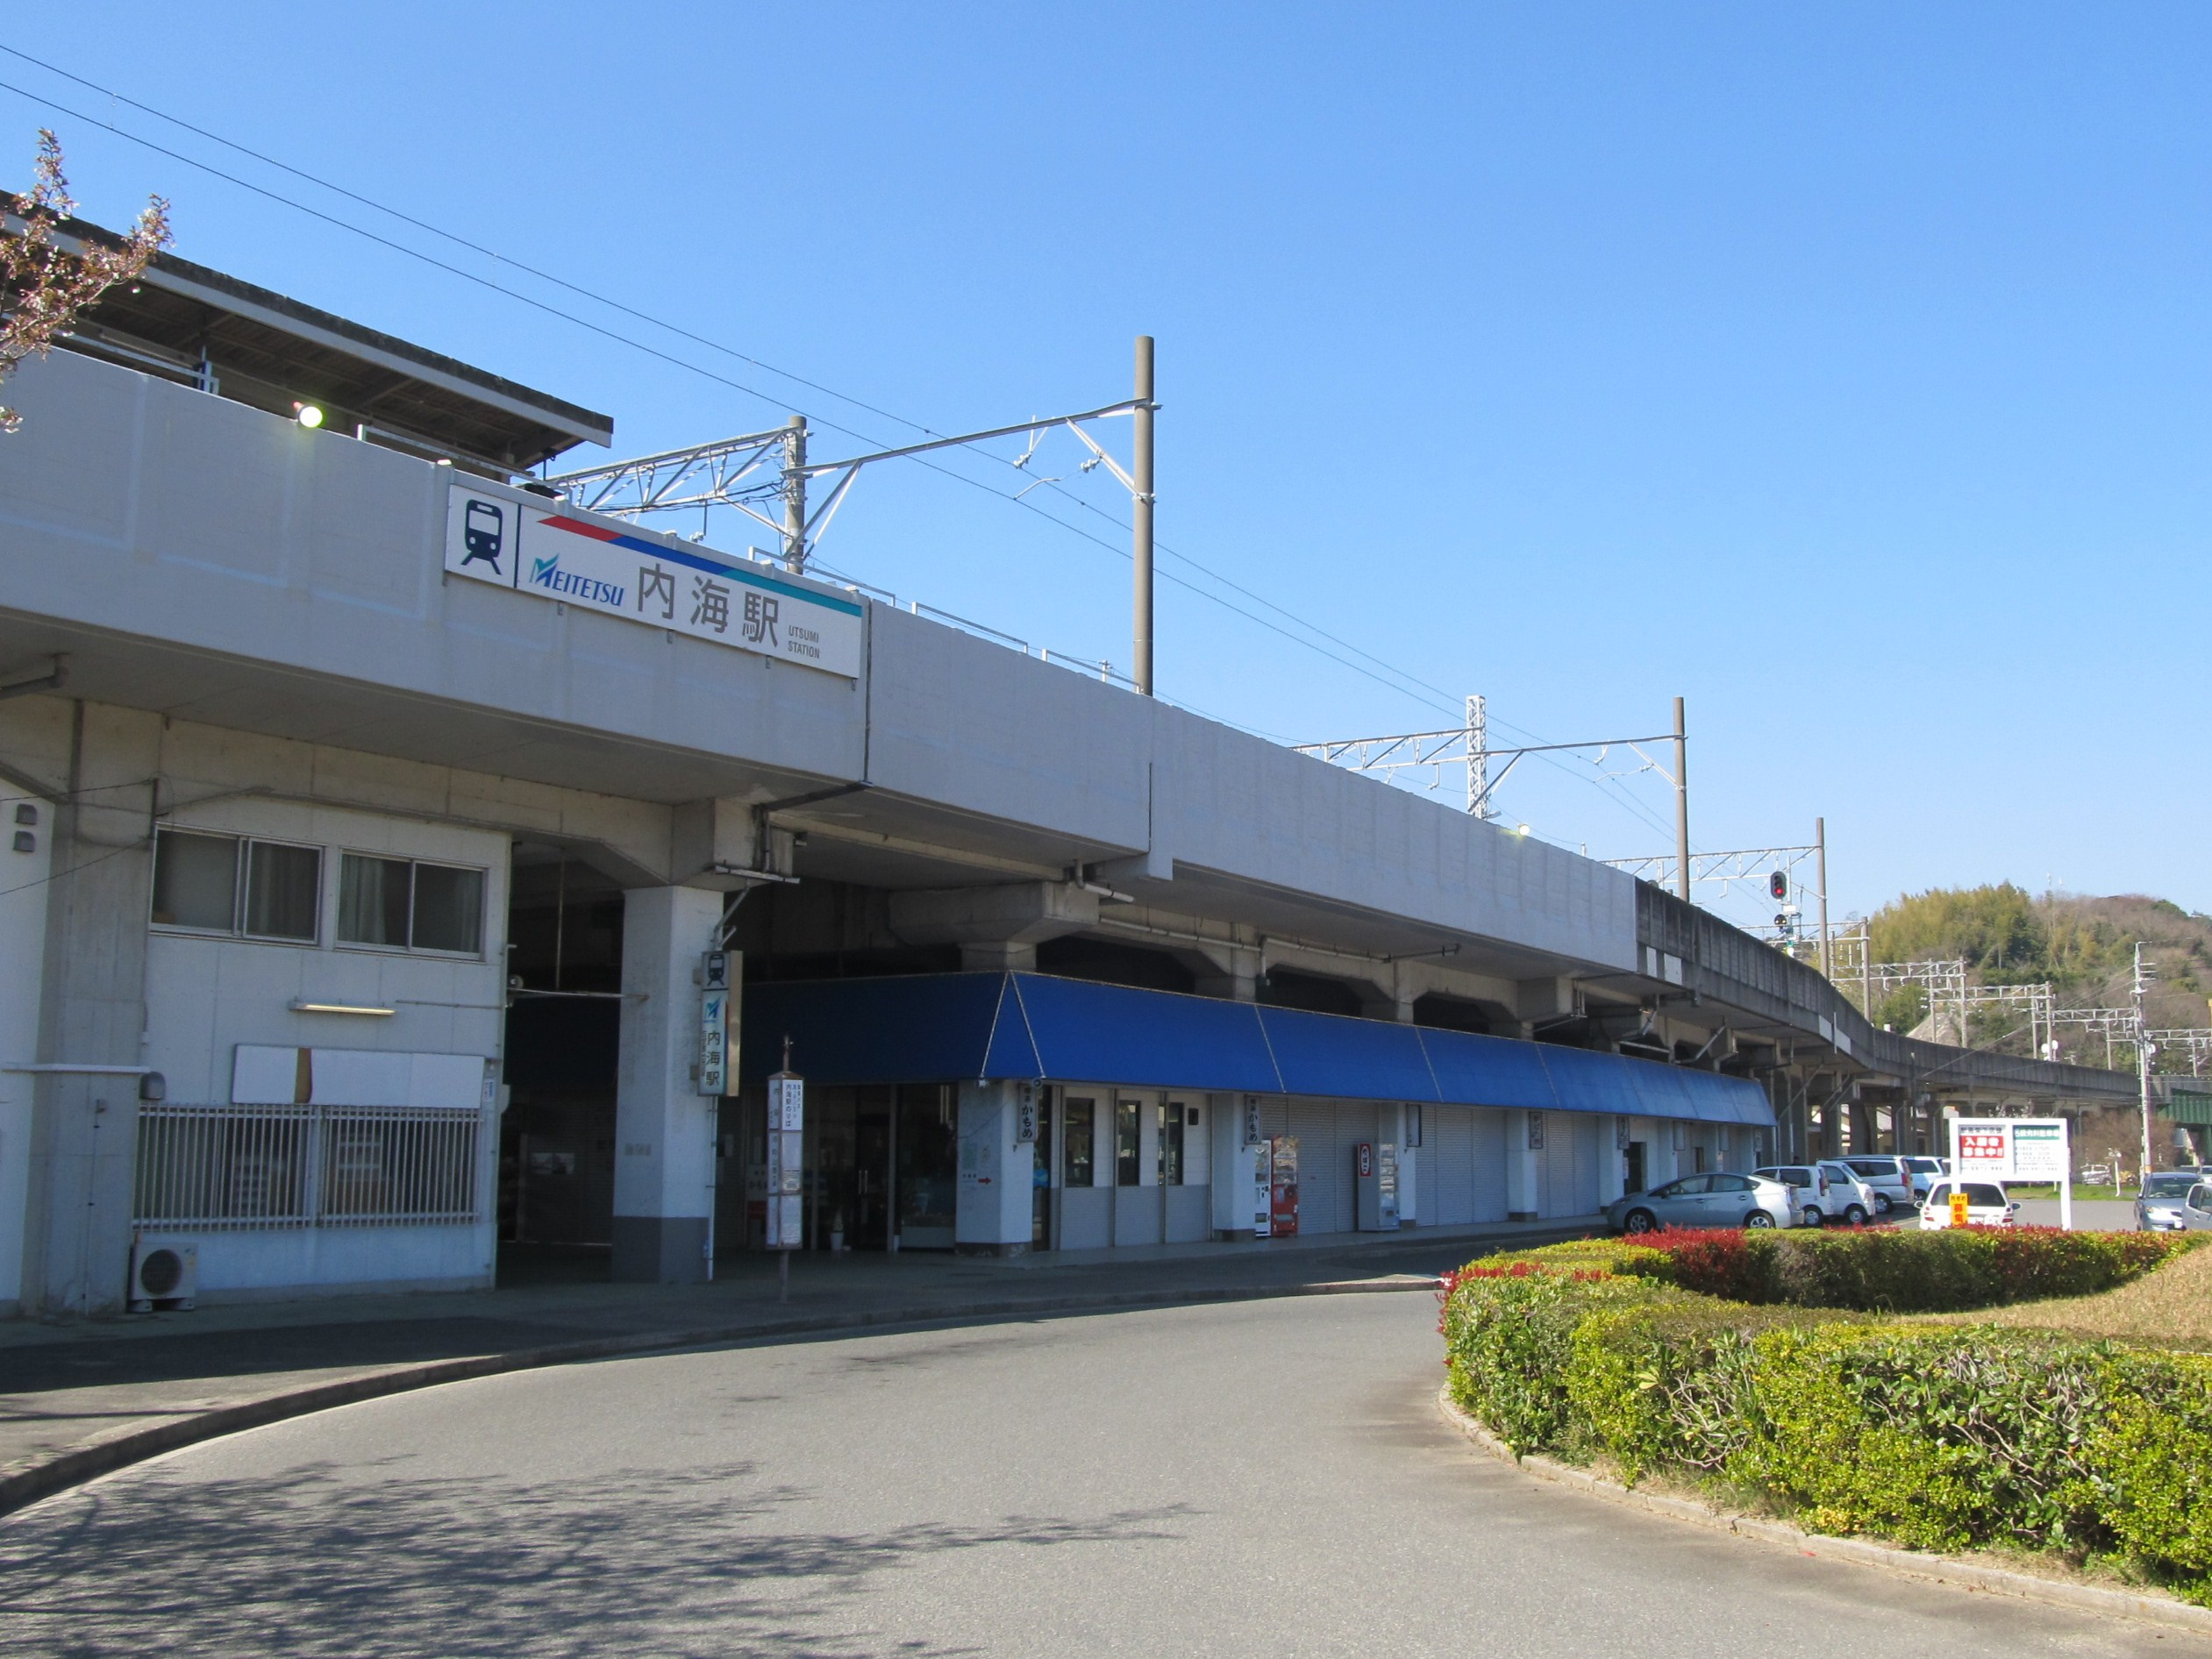 https://upload.wikimedia.org/wikipedia/commons/1/12/MT-Utsumi_Station_2.JPG